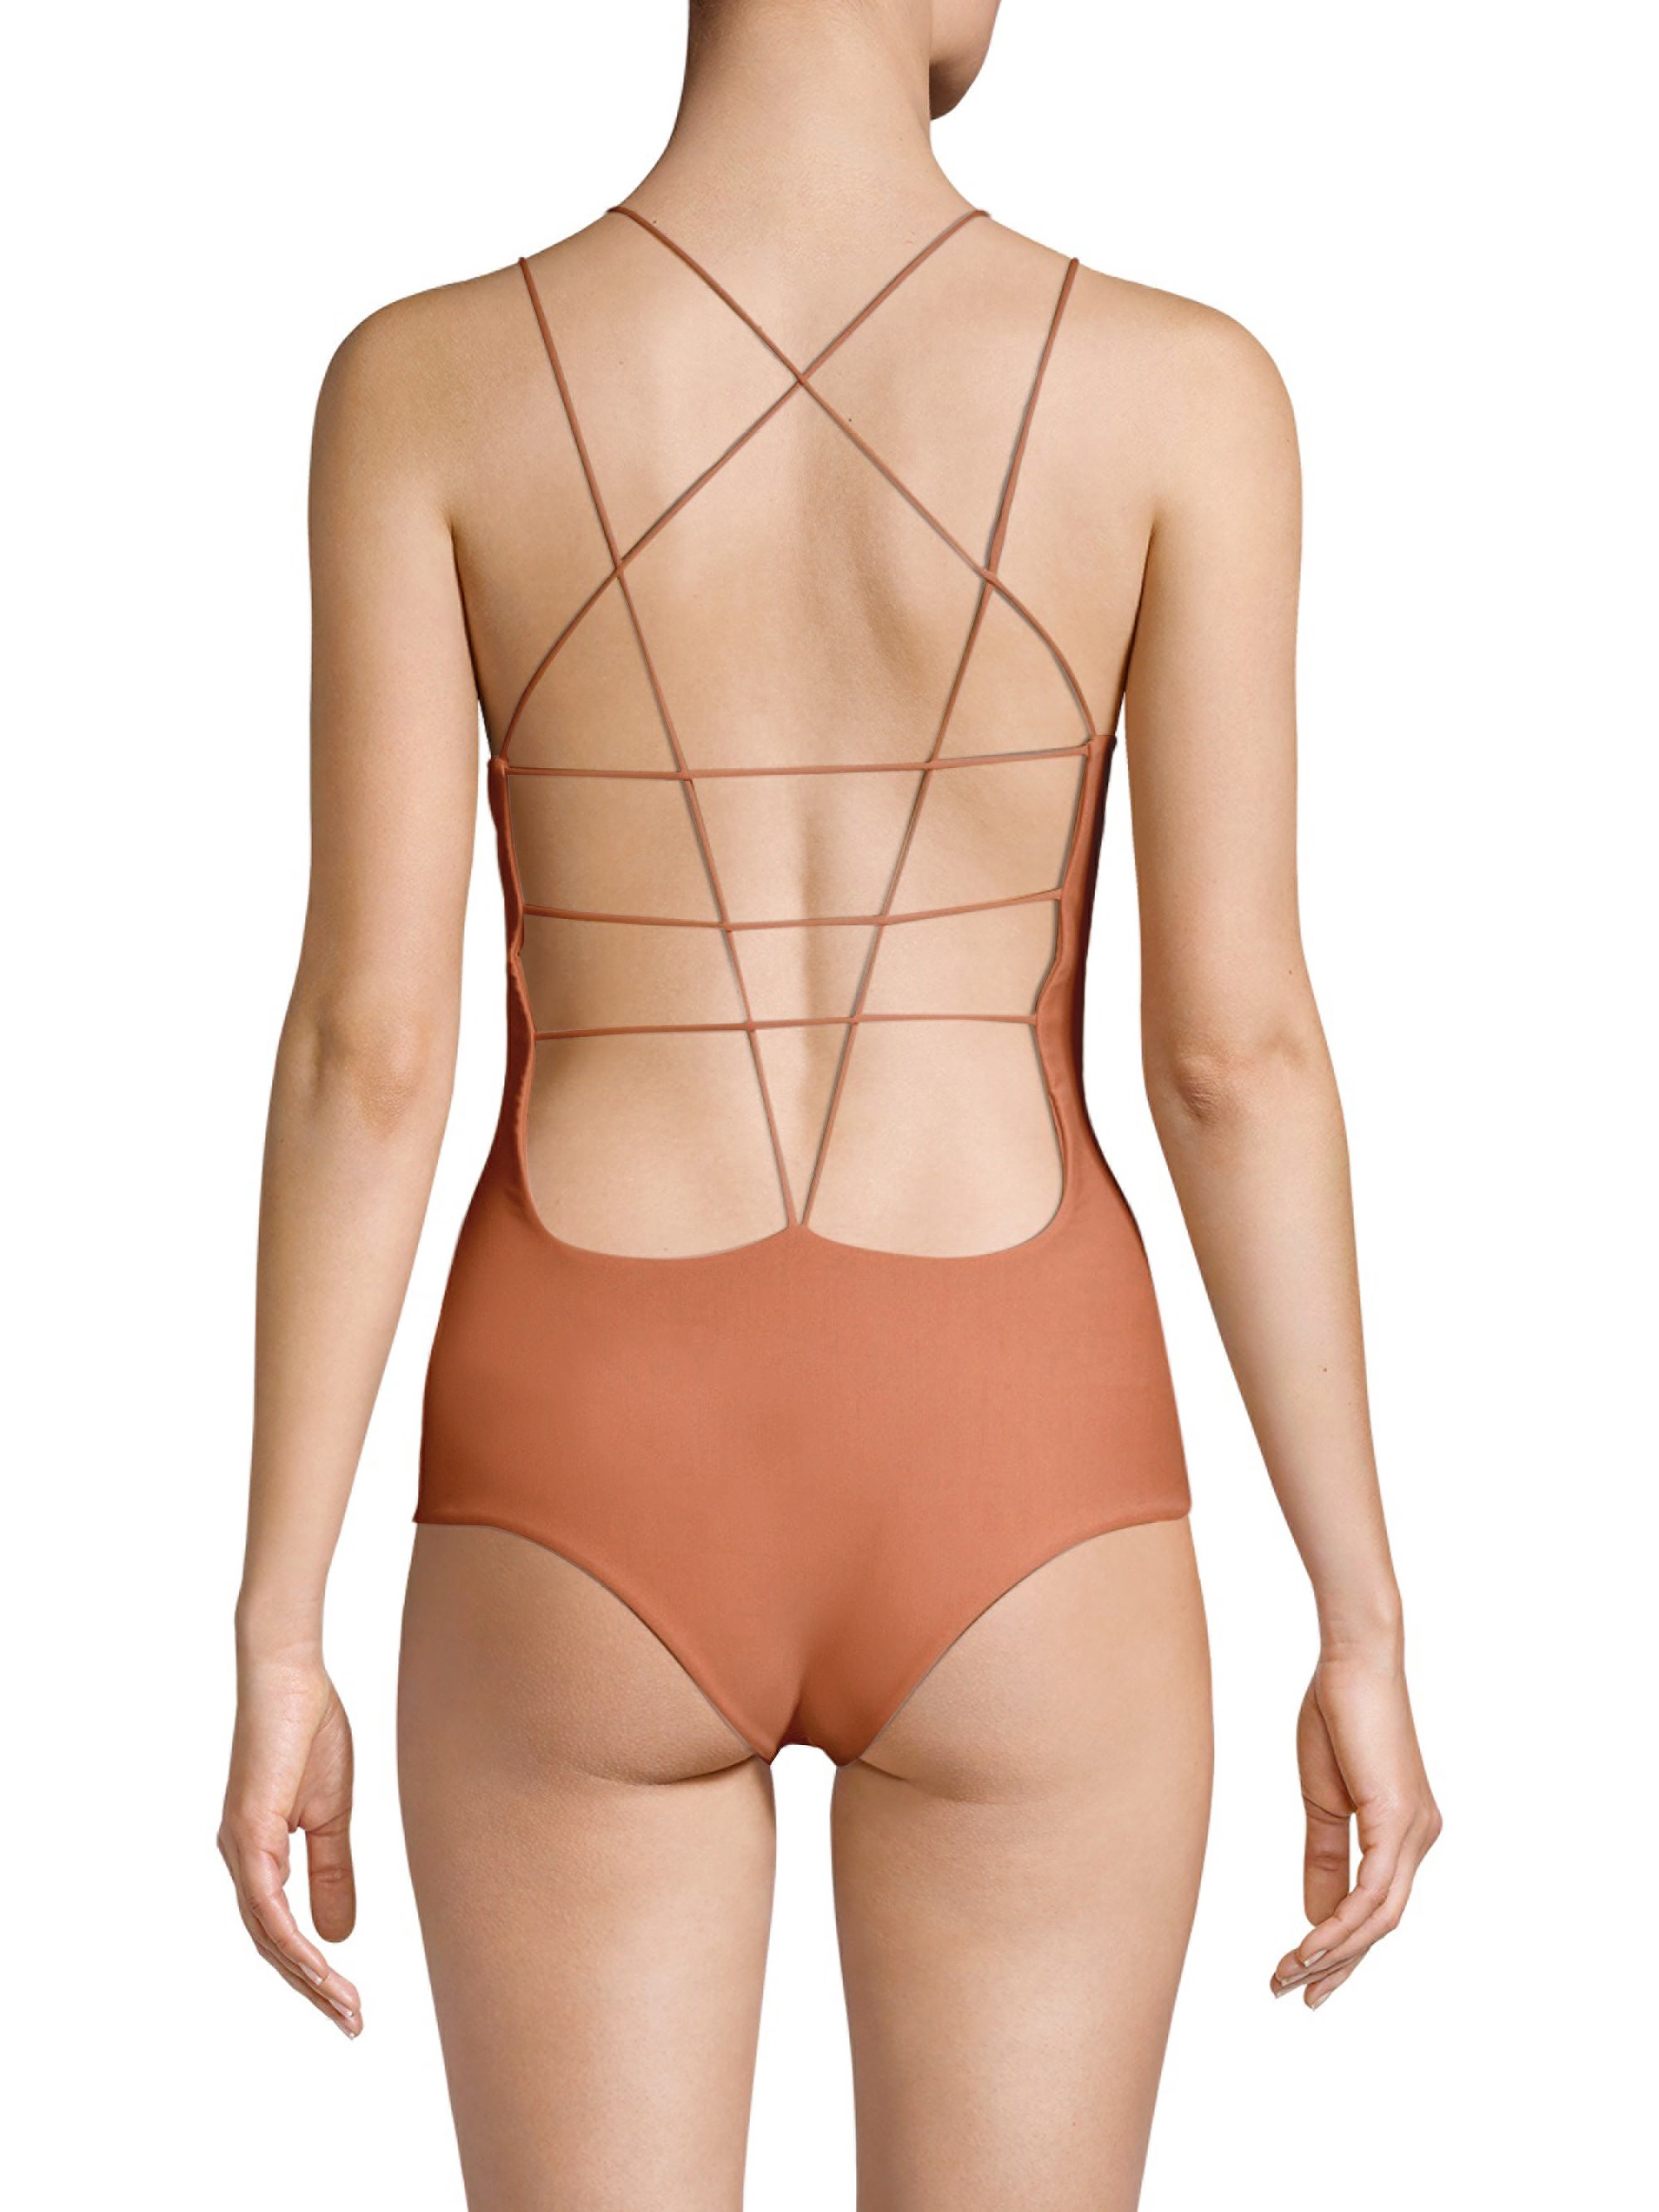 4563c312c44 Mikoh Swimwear Kilauea One-Piece Strappy Back Swimsuit - Honey Small ...